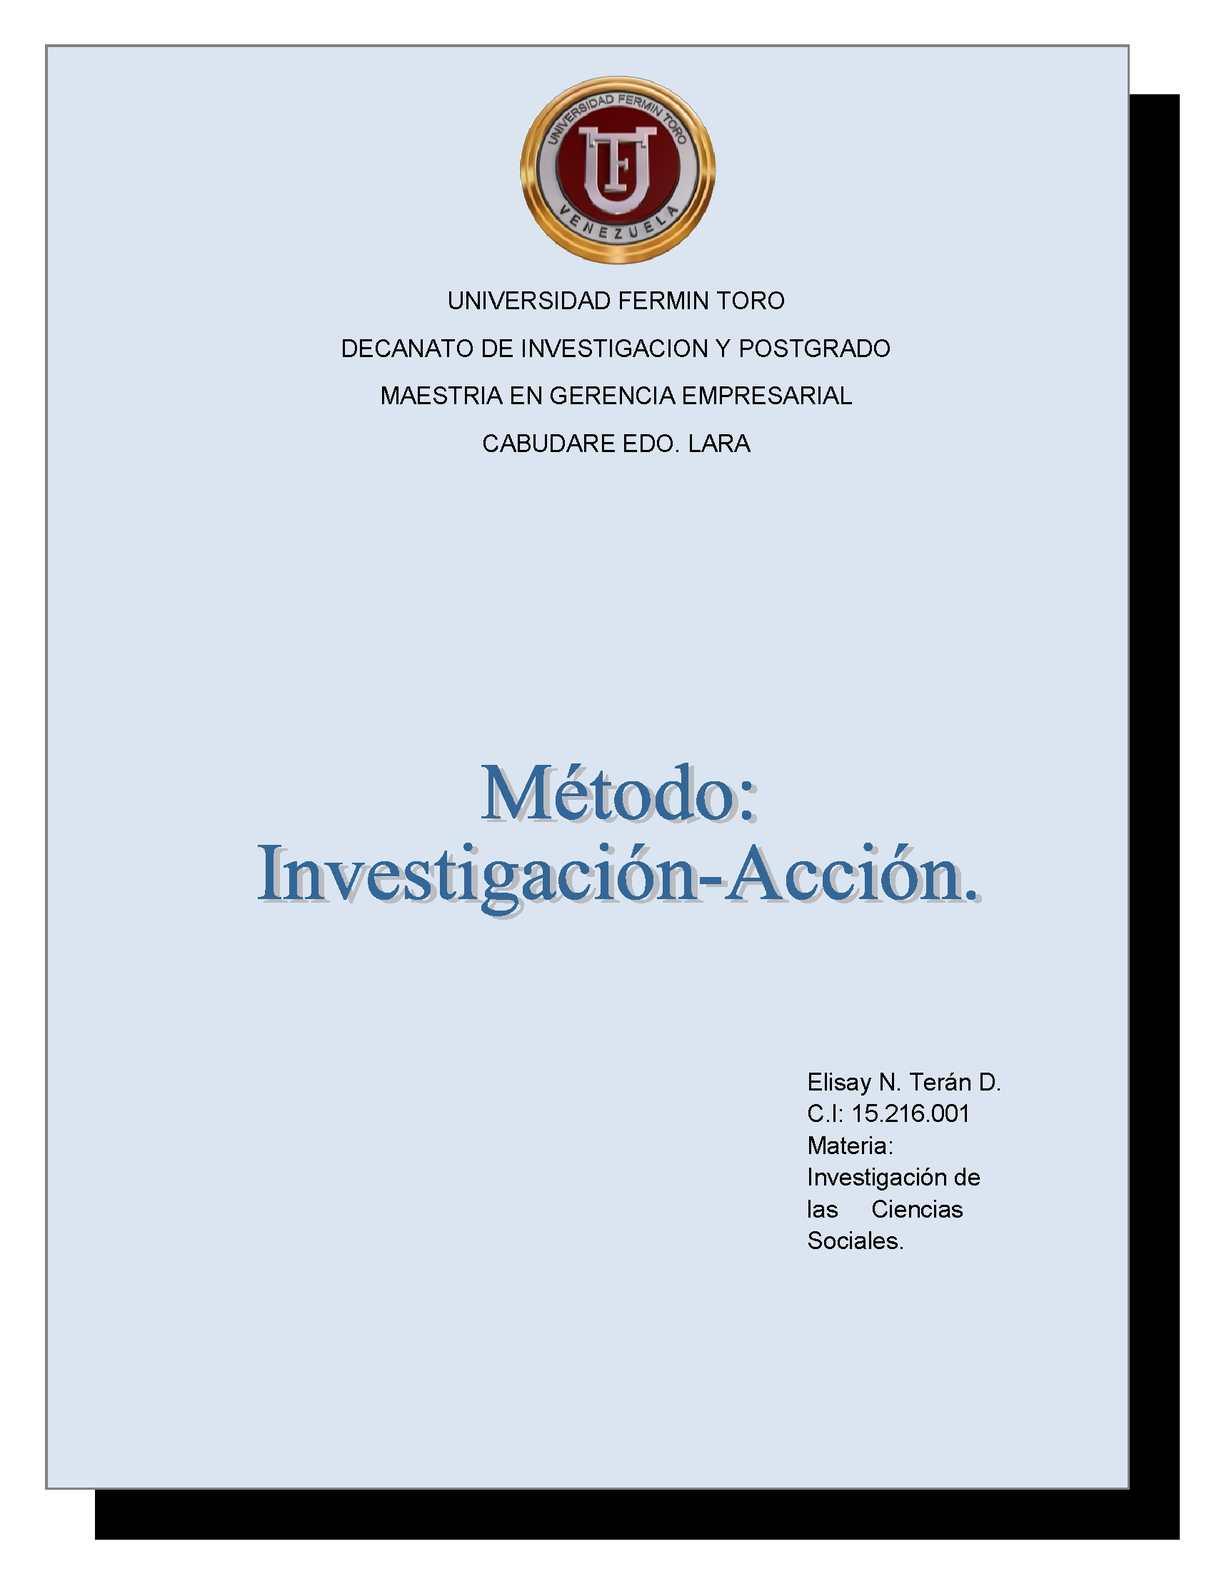 Mètodo Inestigaciòn-Acciòn